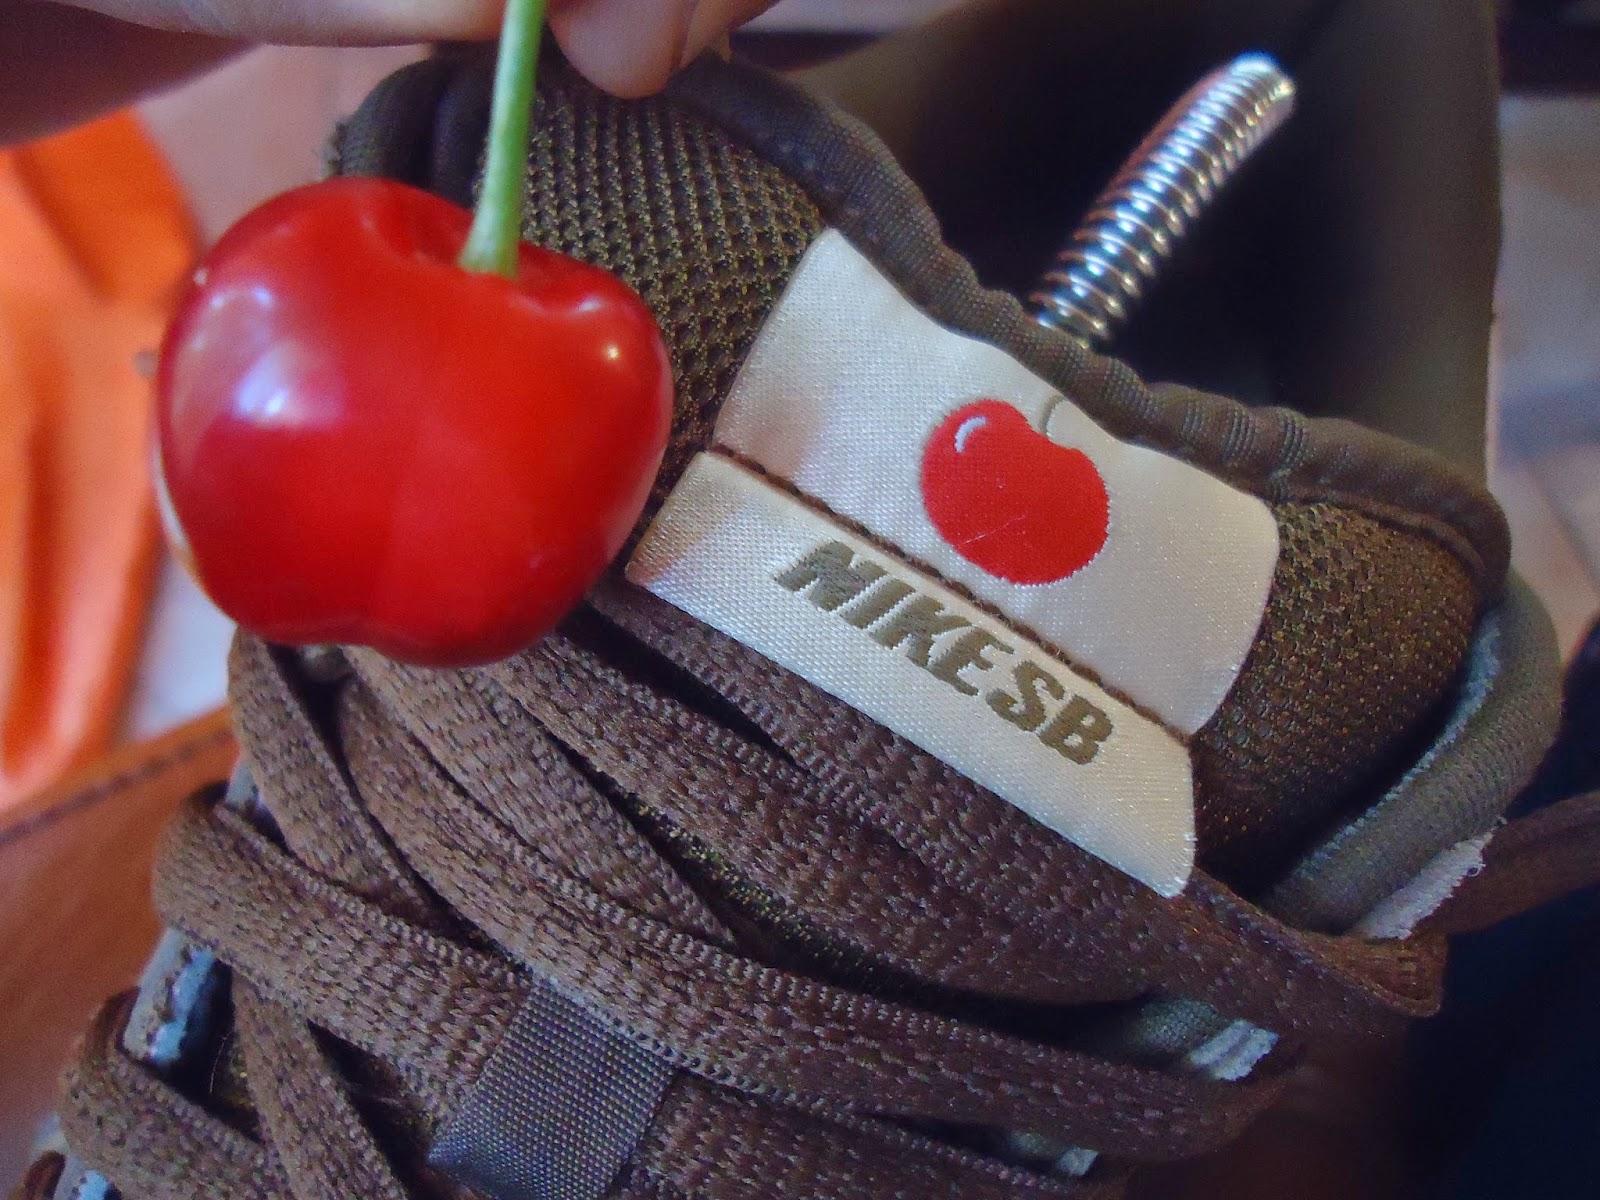 best website 041f2 9fb5f My Kicks Collection: Nike Dunk Low SB Stussy Cherry